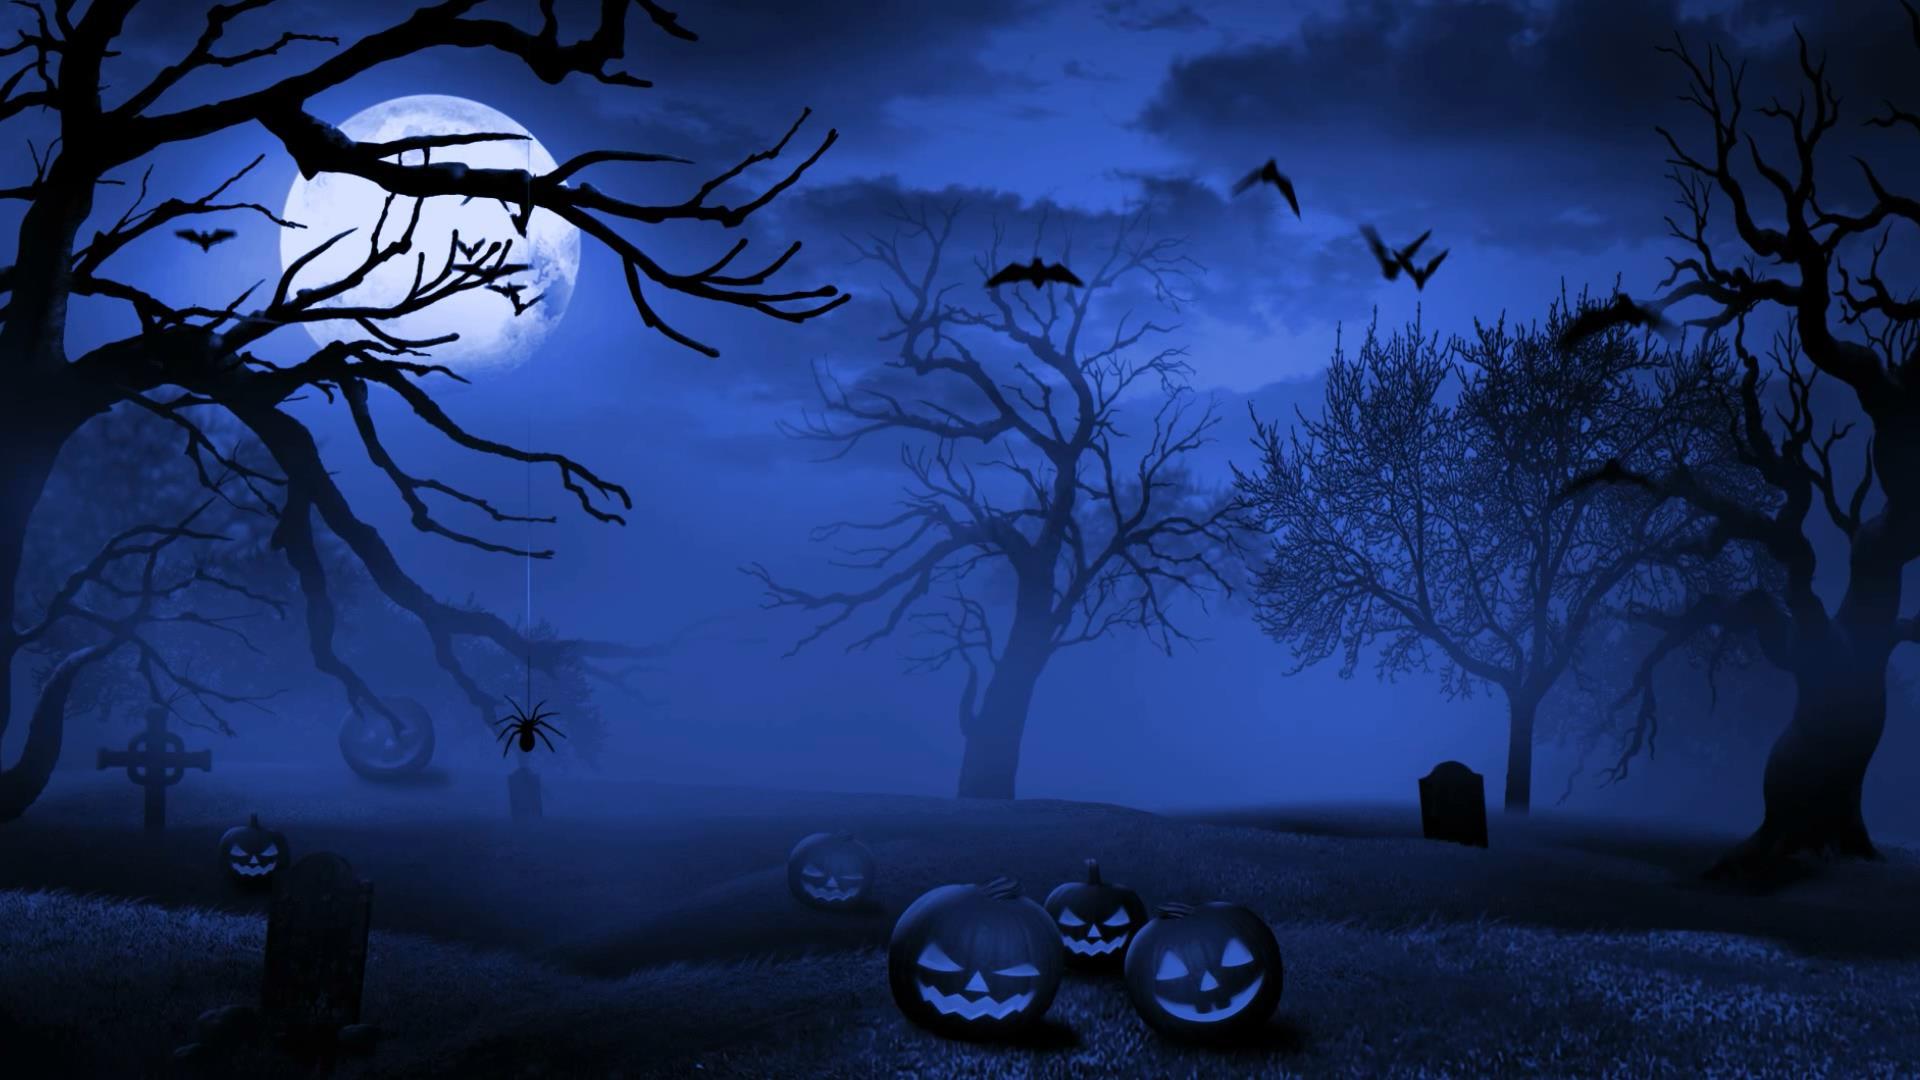 Halloween fond d 39 cran hd arri re plan 1920x1080 id for Fond ecran casa de papel